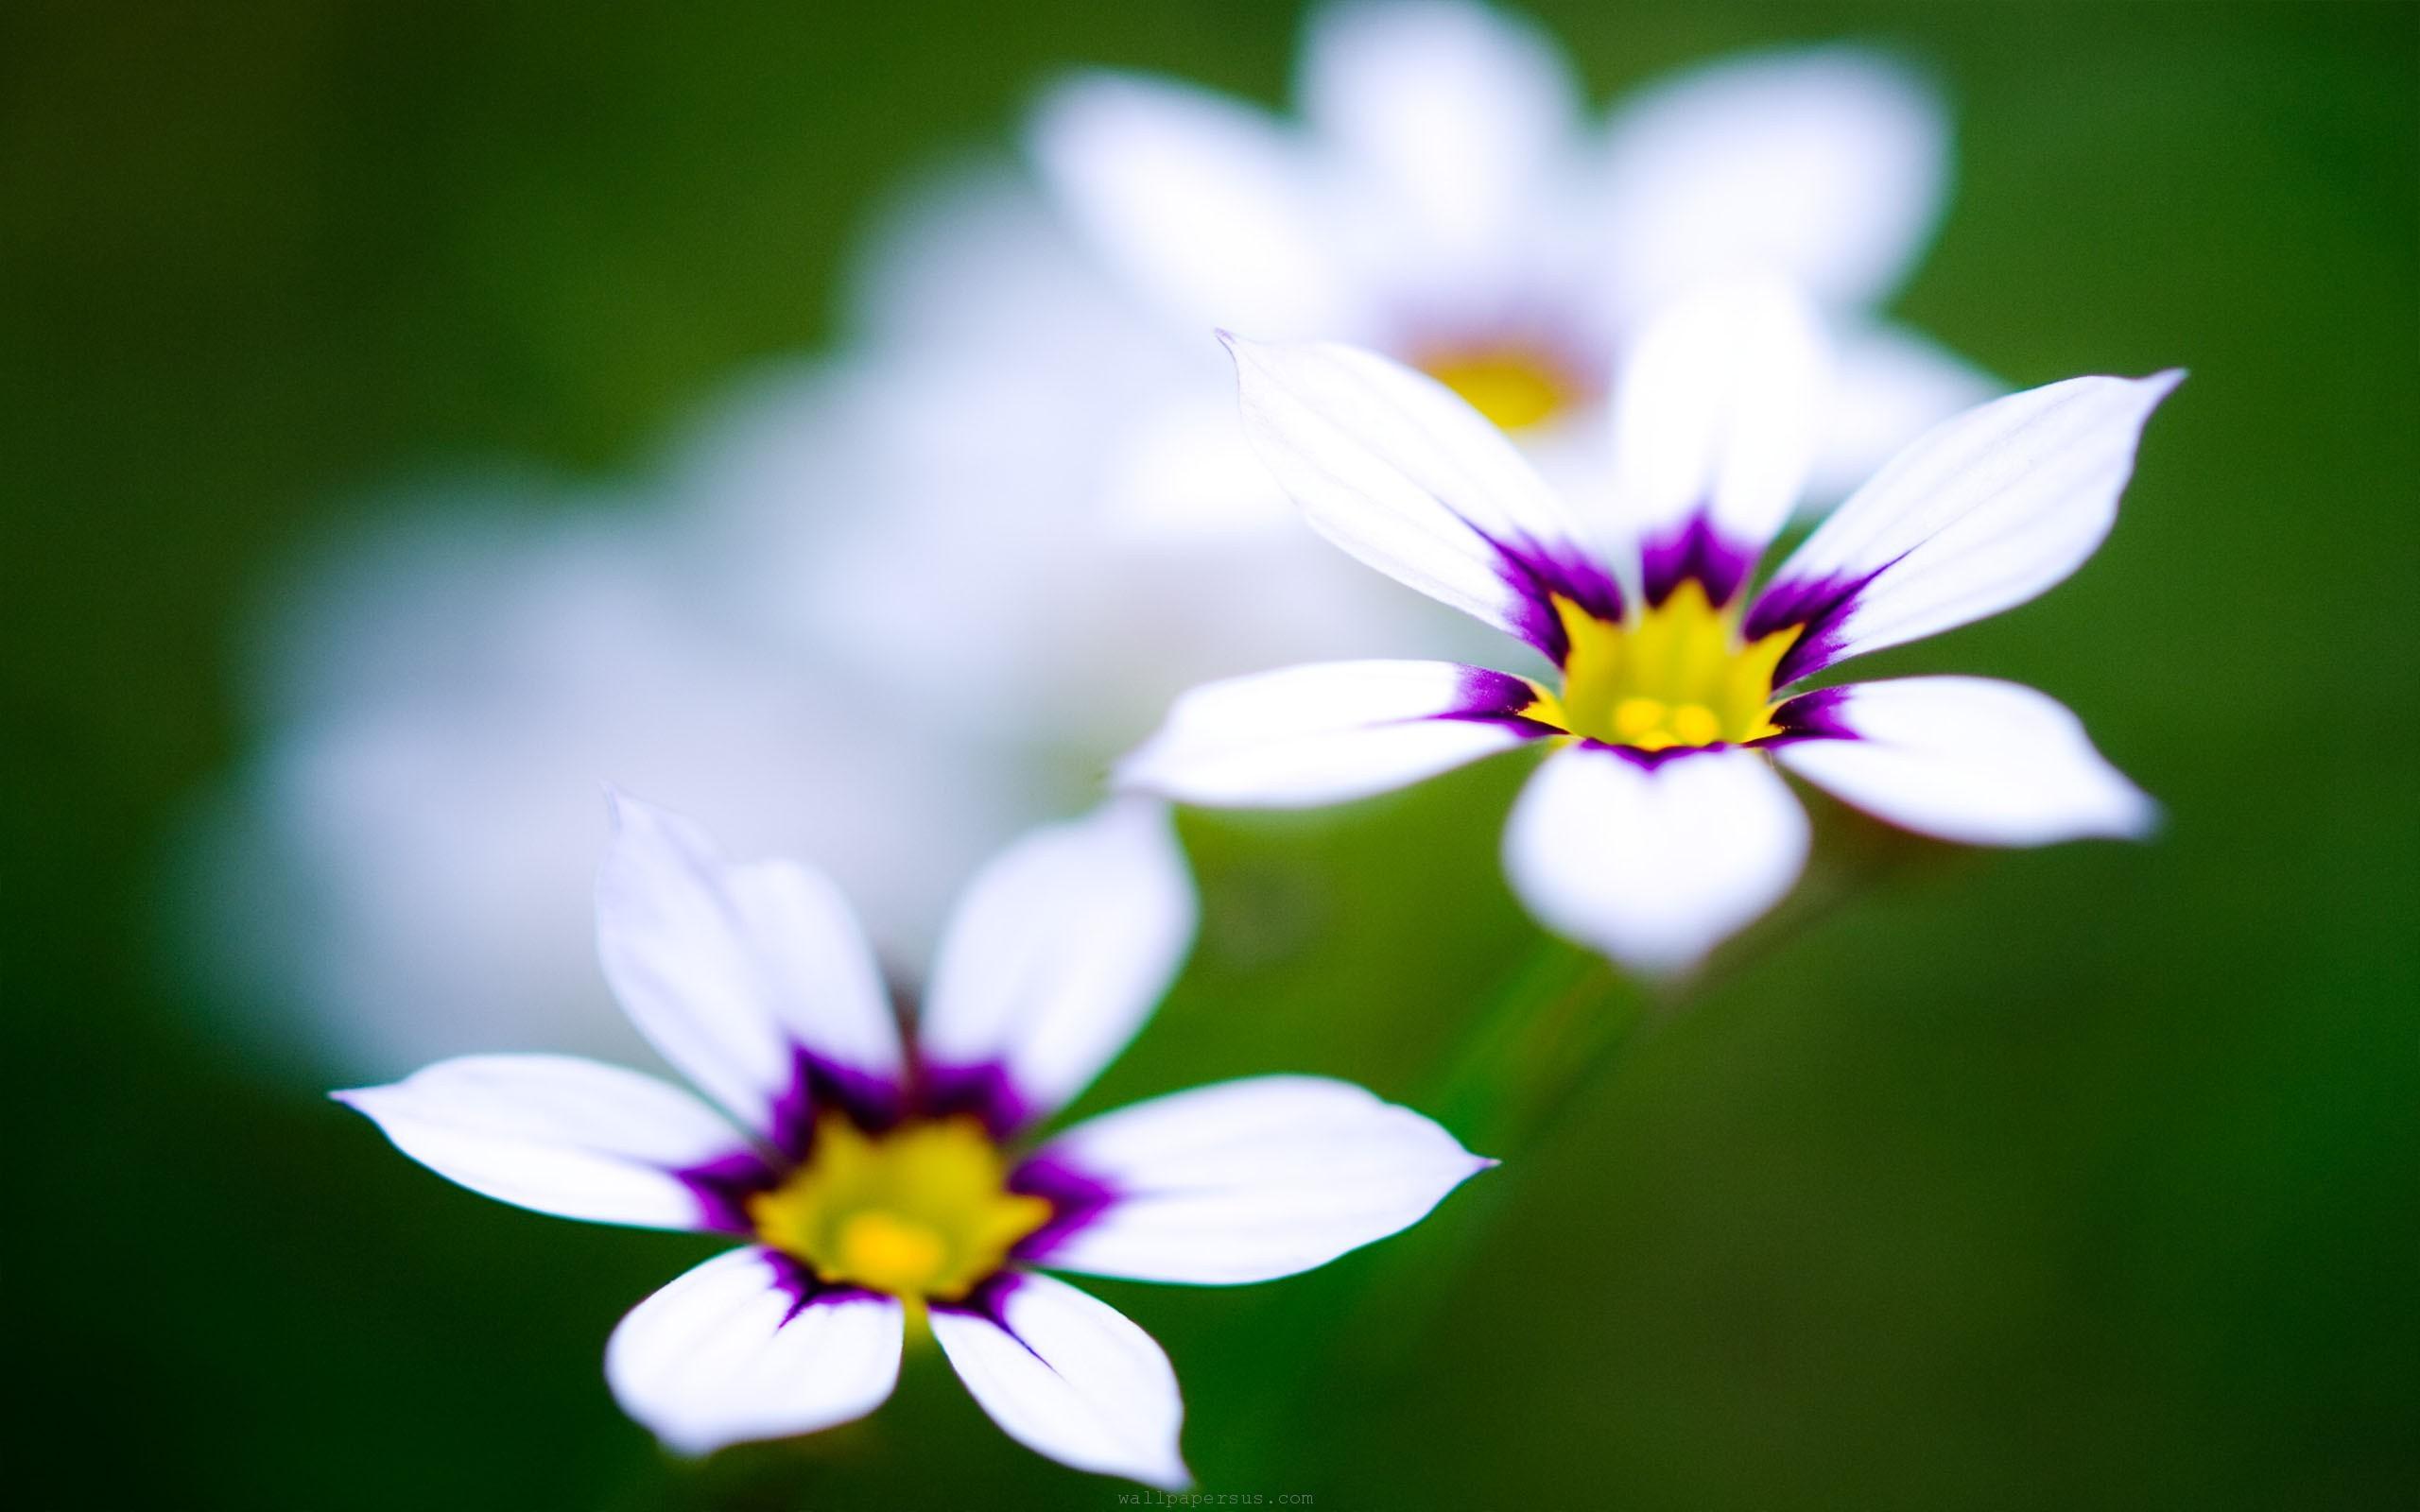 Cute Flowers Images Sf Wallpaper